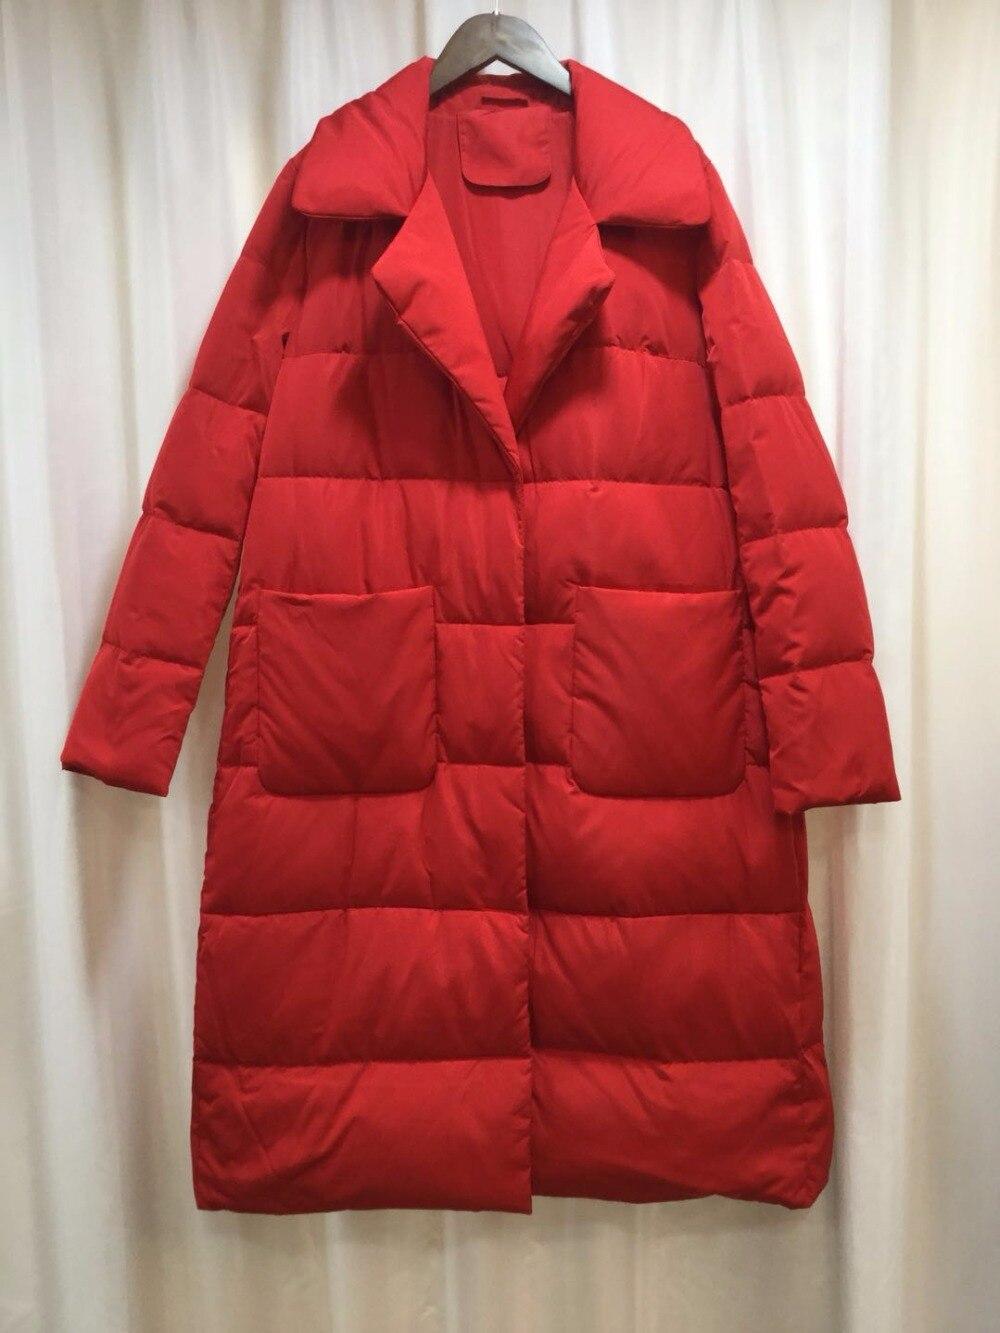 2019 moda de marca 100% pato blanco abajo grueso de abrigo parkas abrigo femenino traje Cuello estilo de capa chaqueta de abrigo largo de plumas wq75